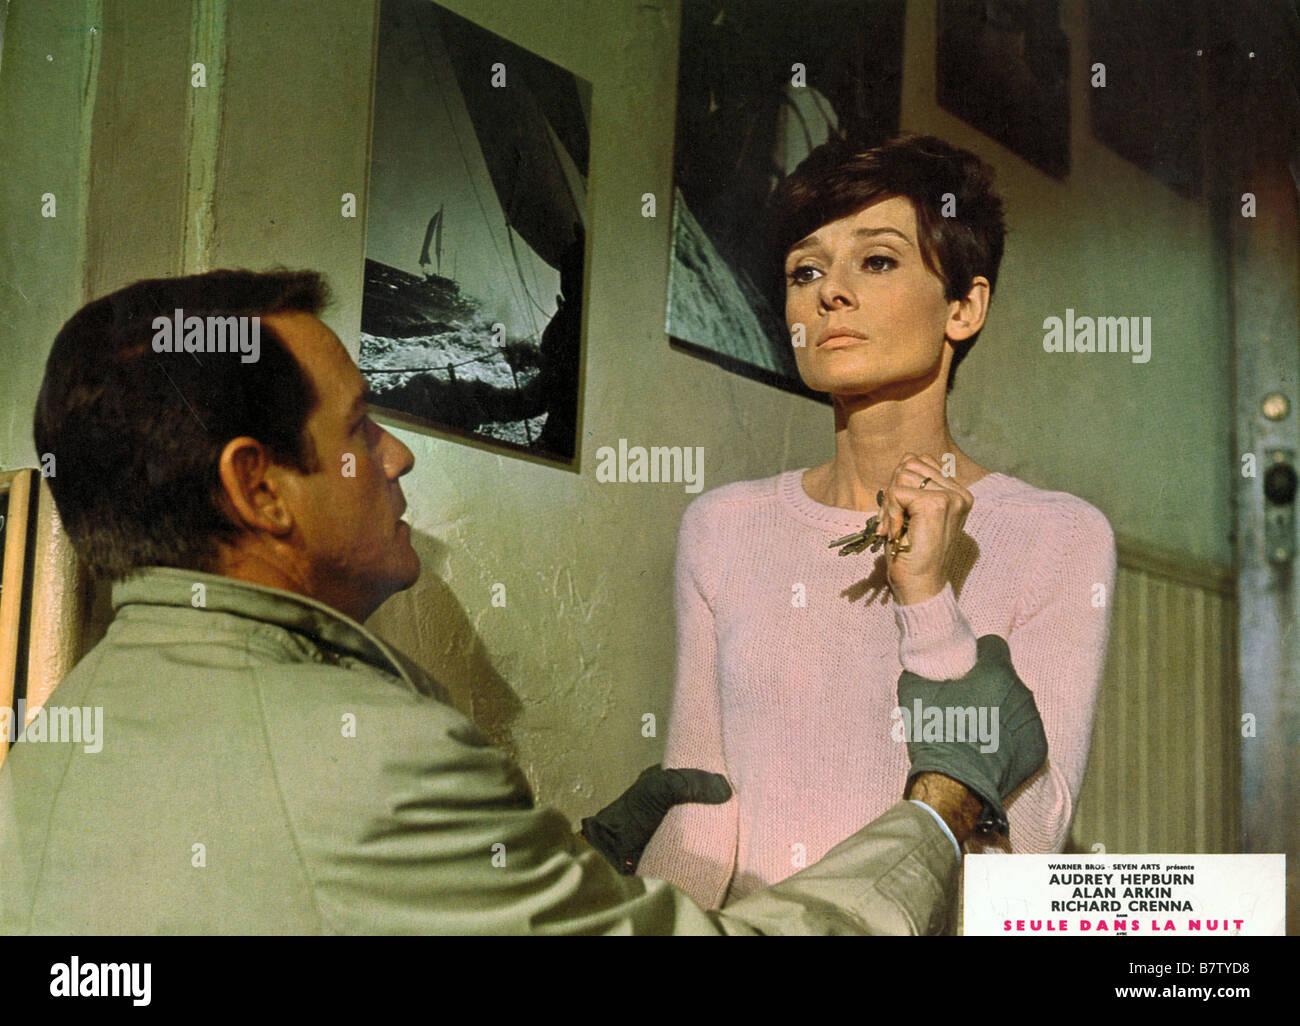 seule dans la nuit Wait Until Dark  Year: 1967 USA Audrey Hepburn, Richard Crenna  Director: Terence Young - Stock Image